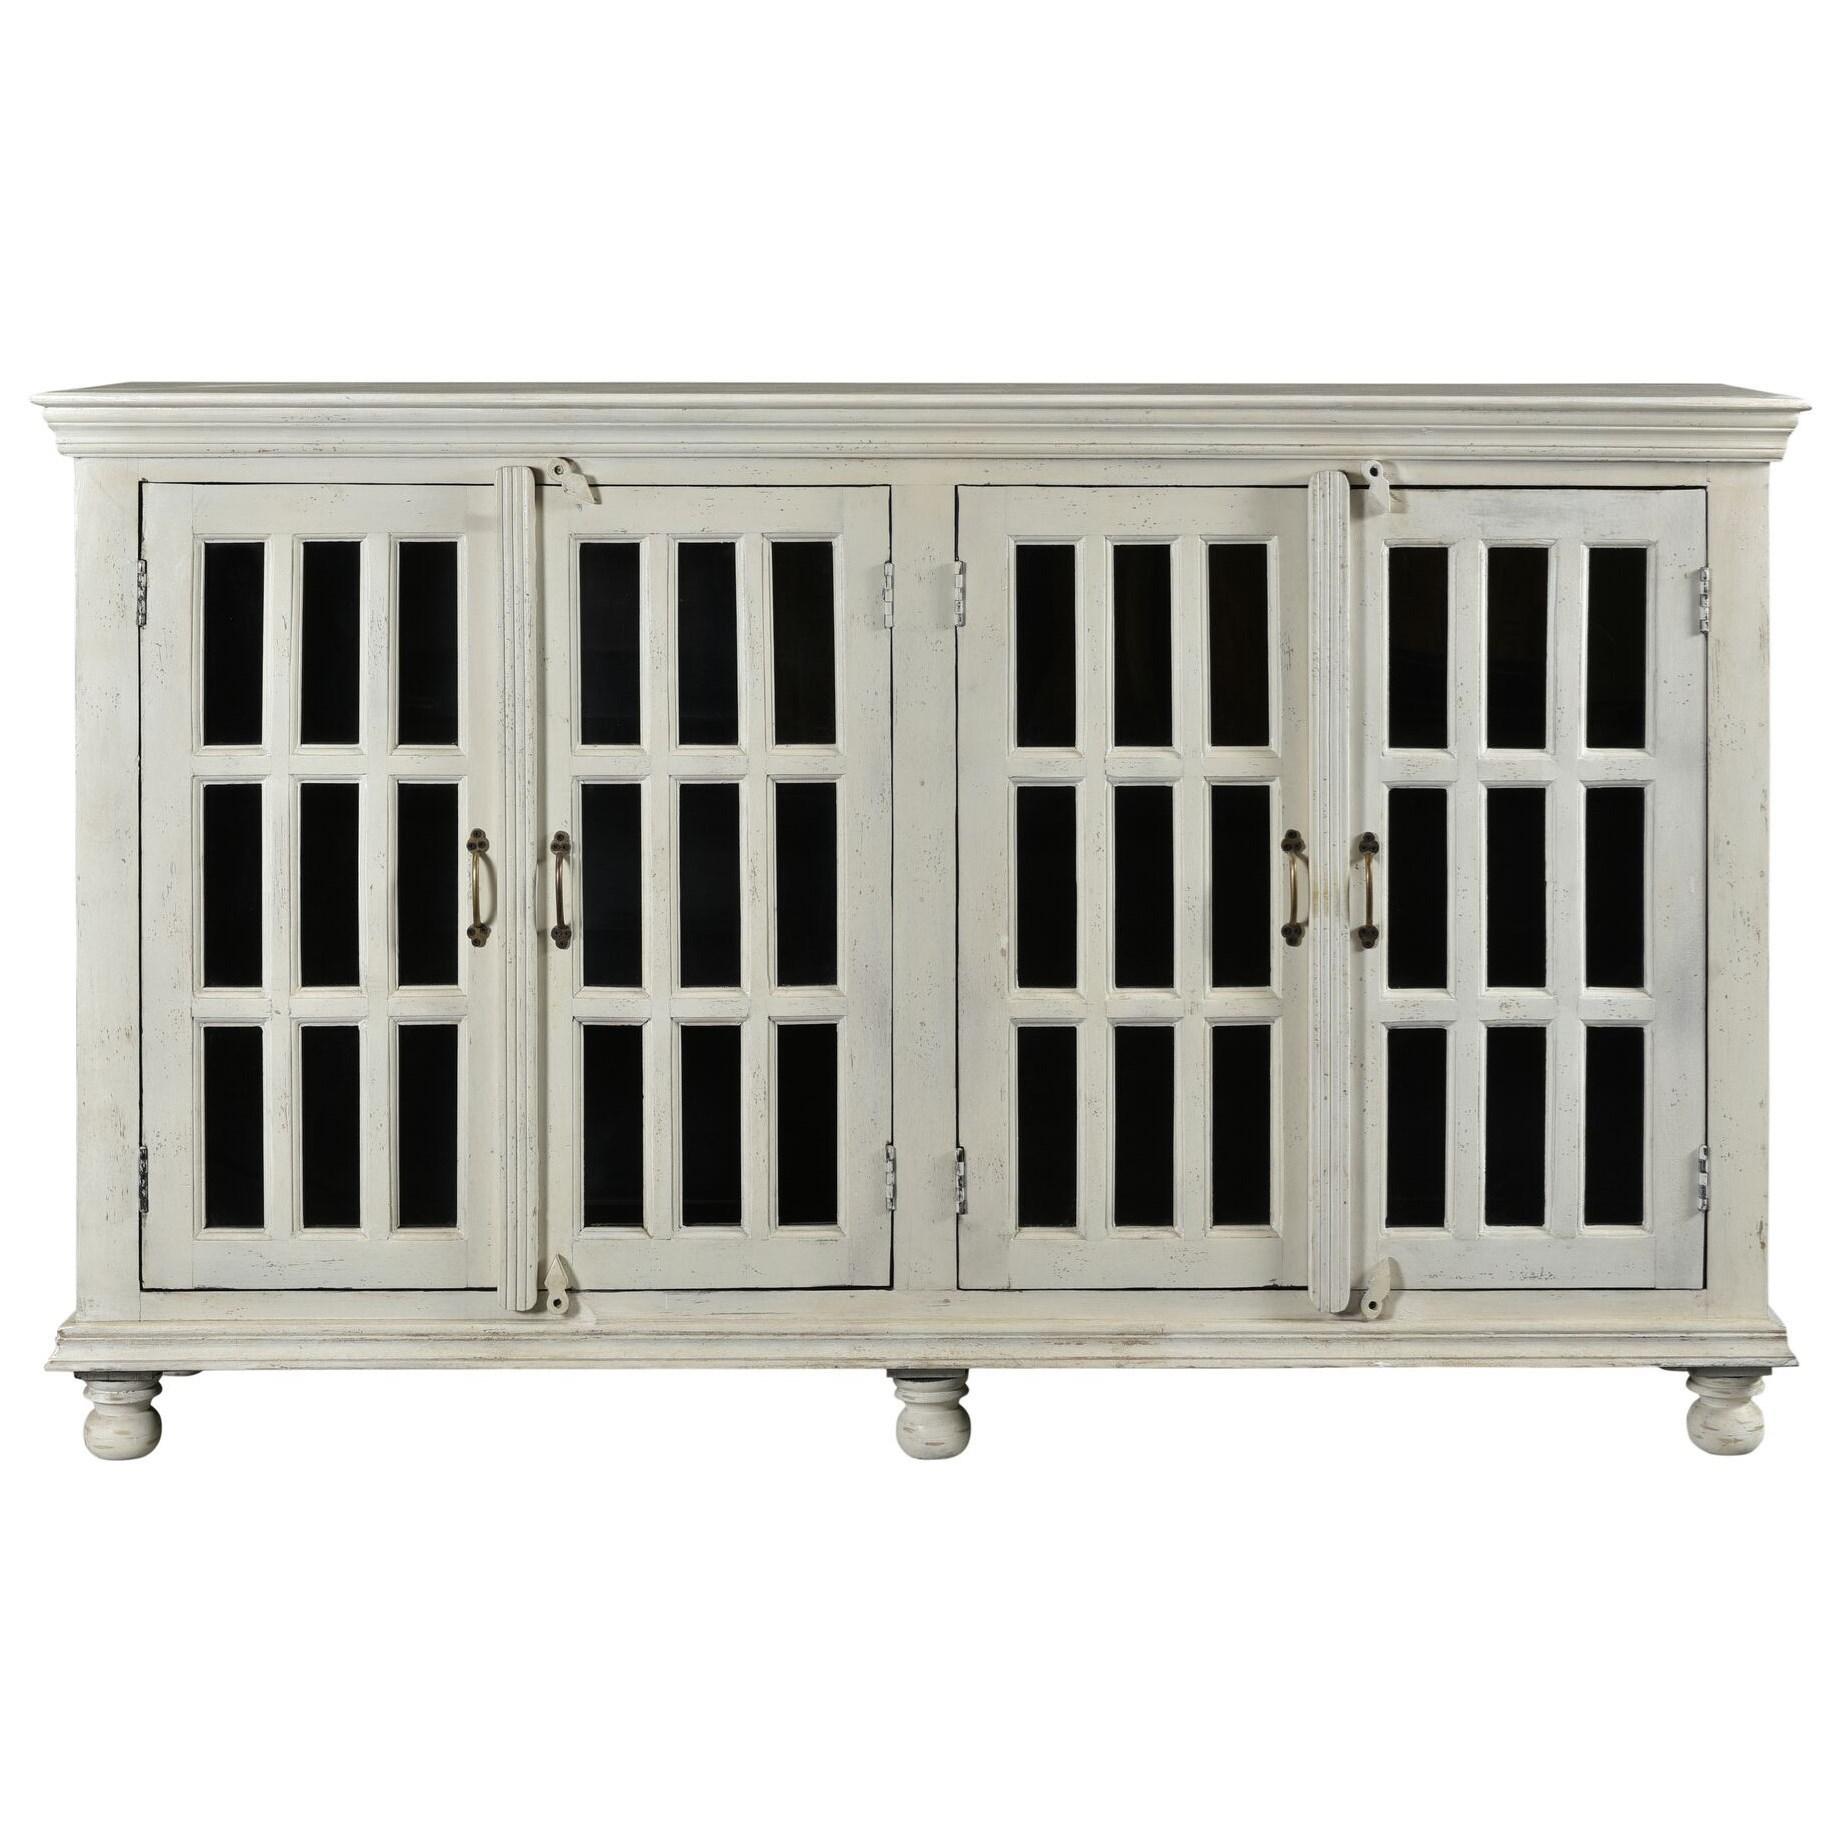 asdf Four Door Credenza by C2C at Walker's Furniture